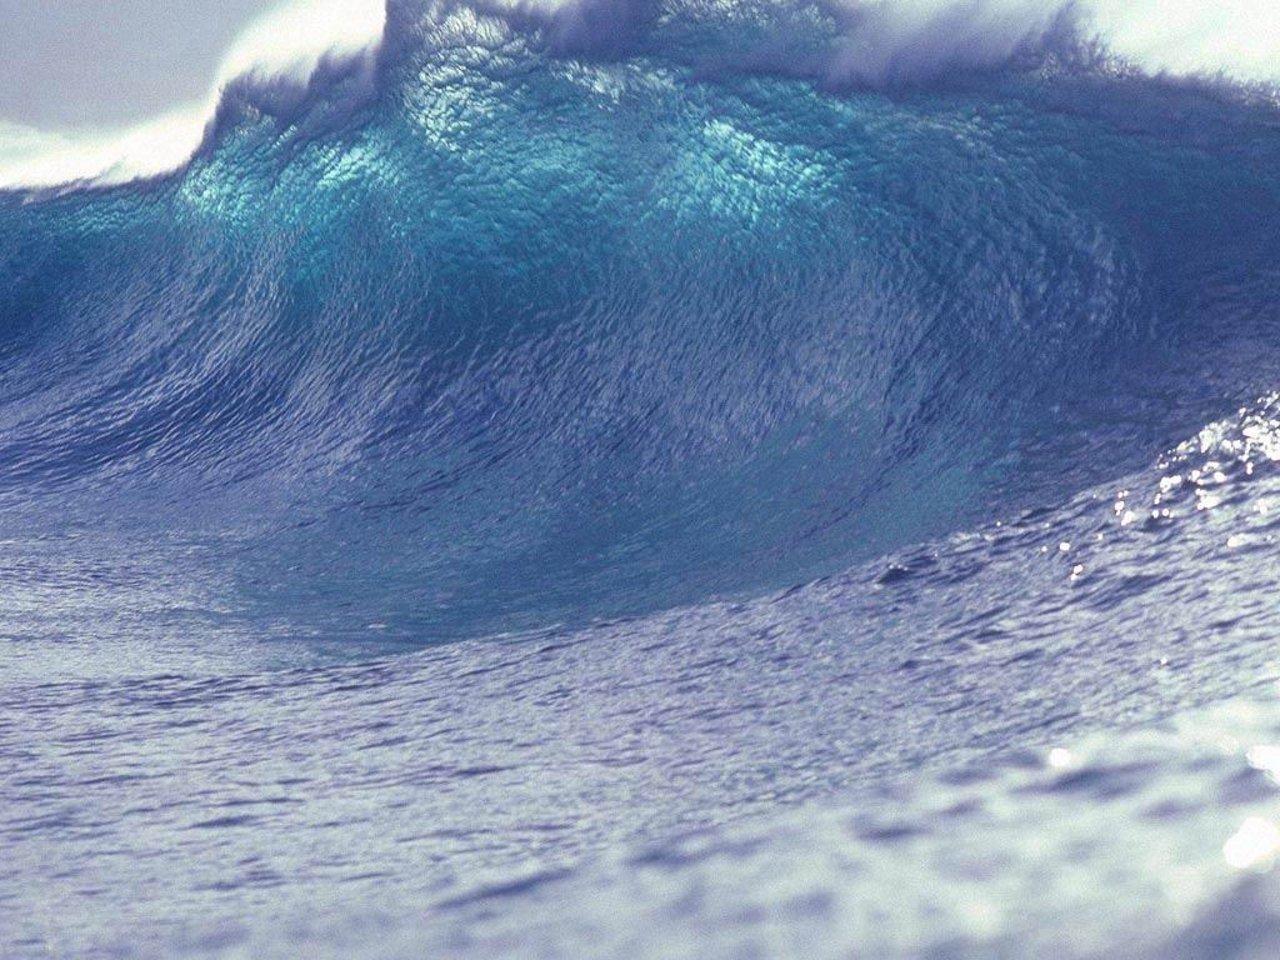 wave-11061.jpg